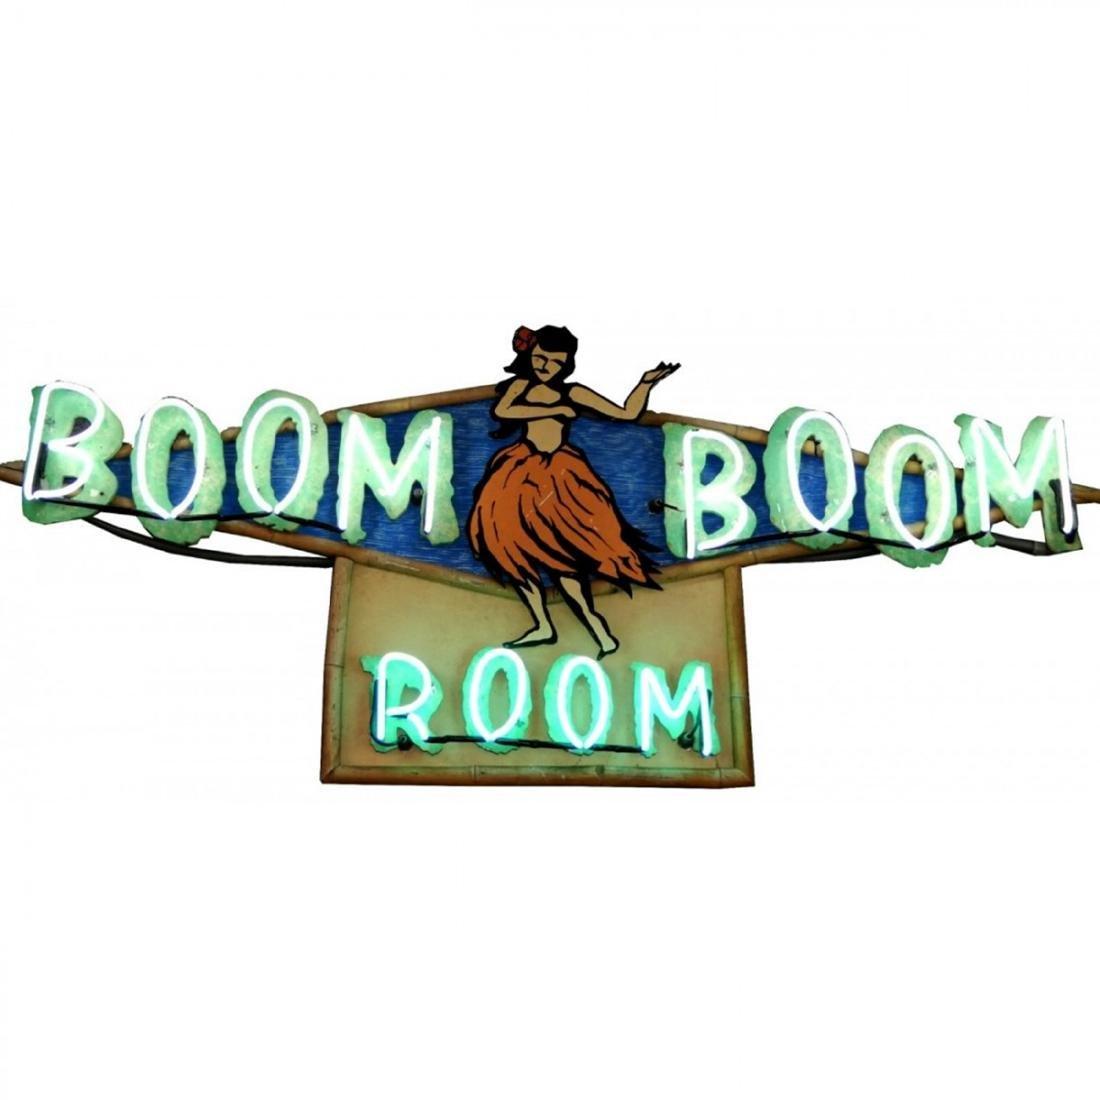 Original restored Boom Boom Room neon sign